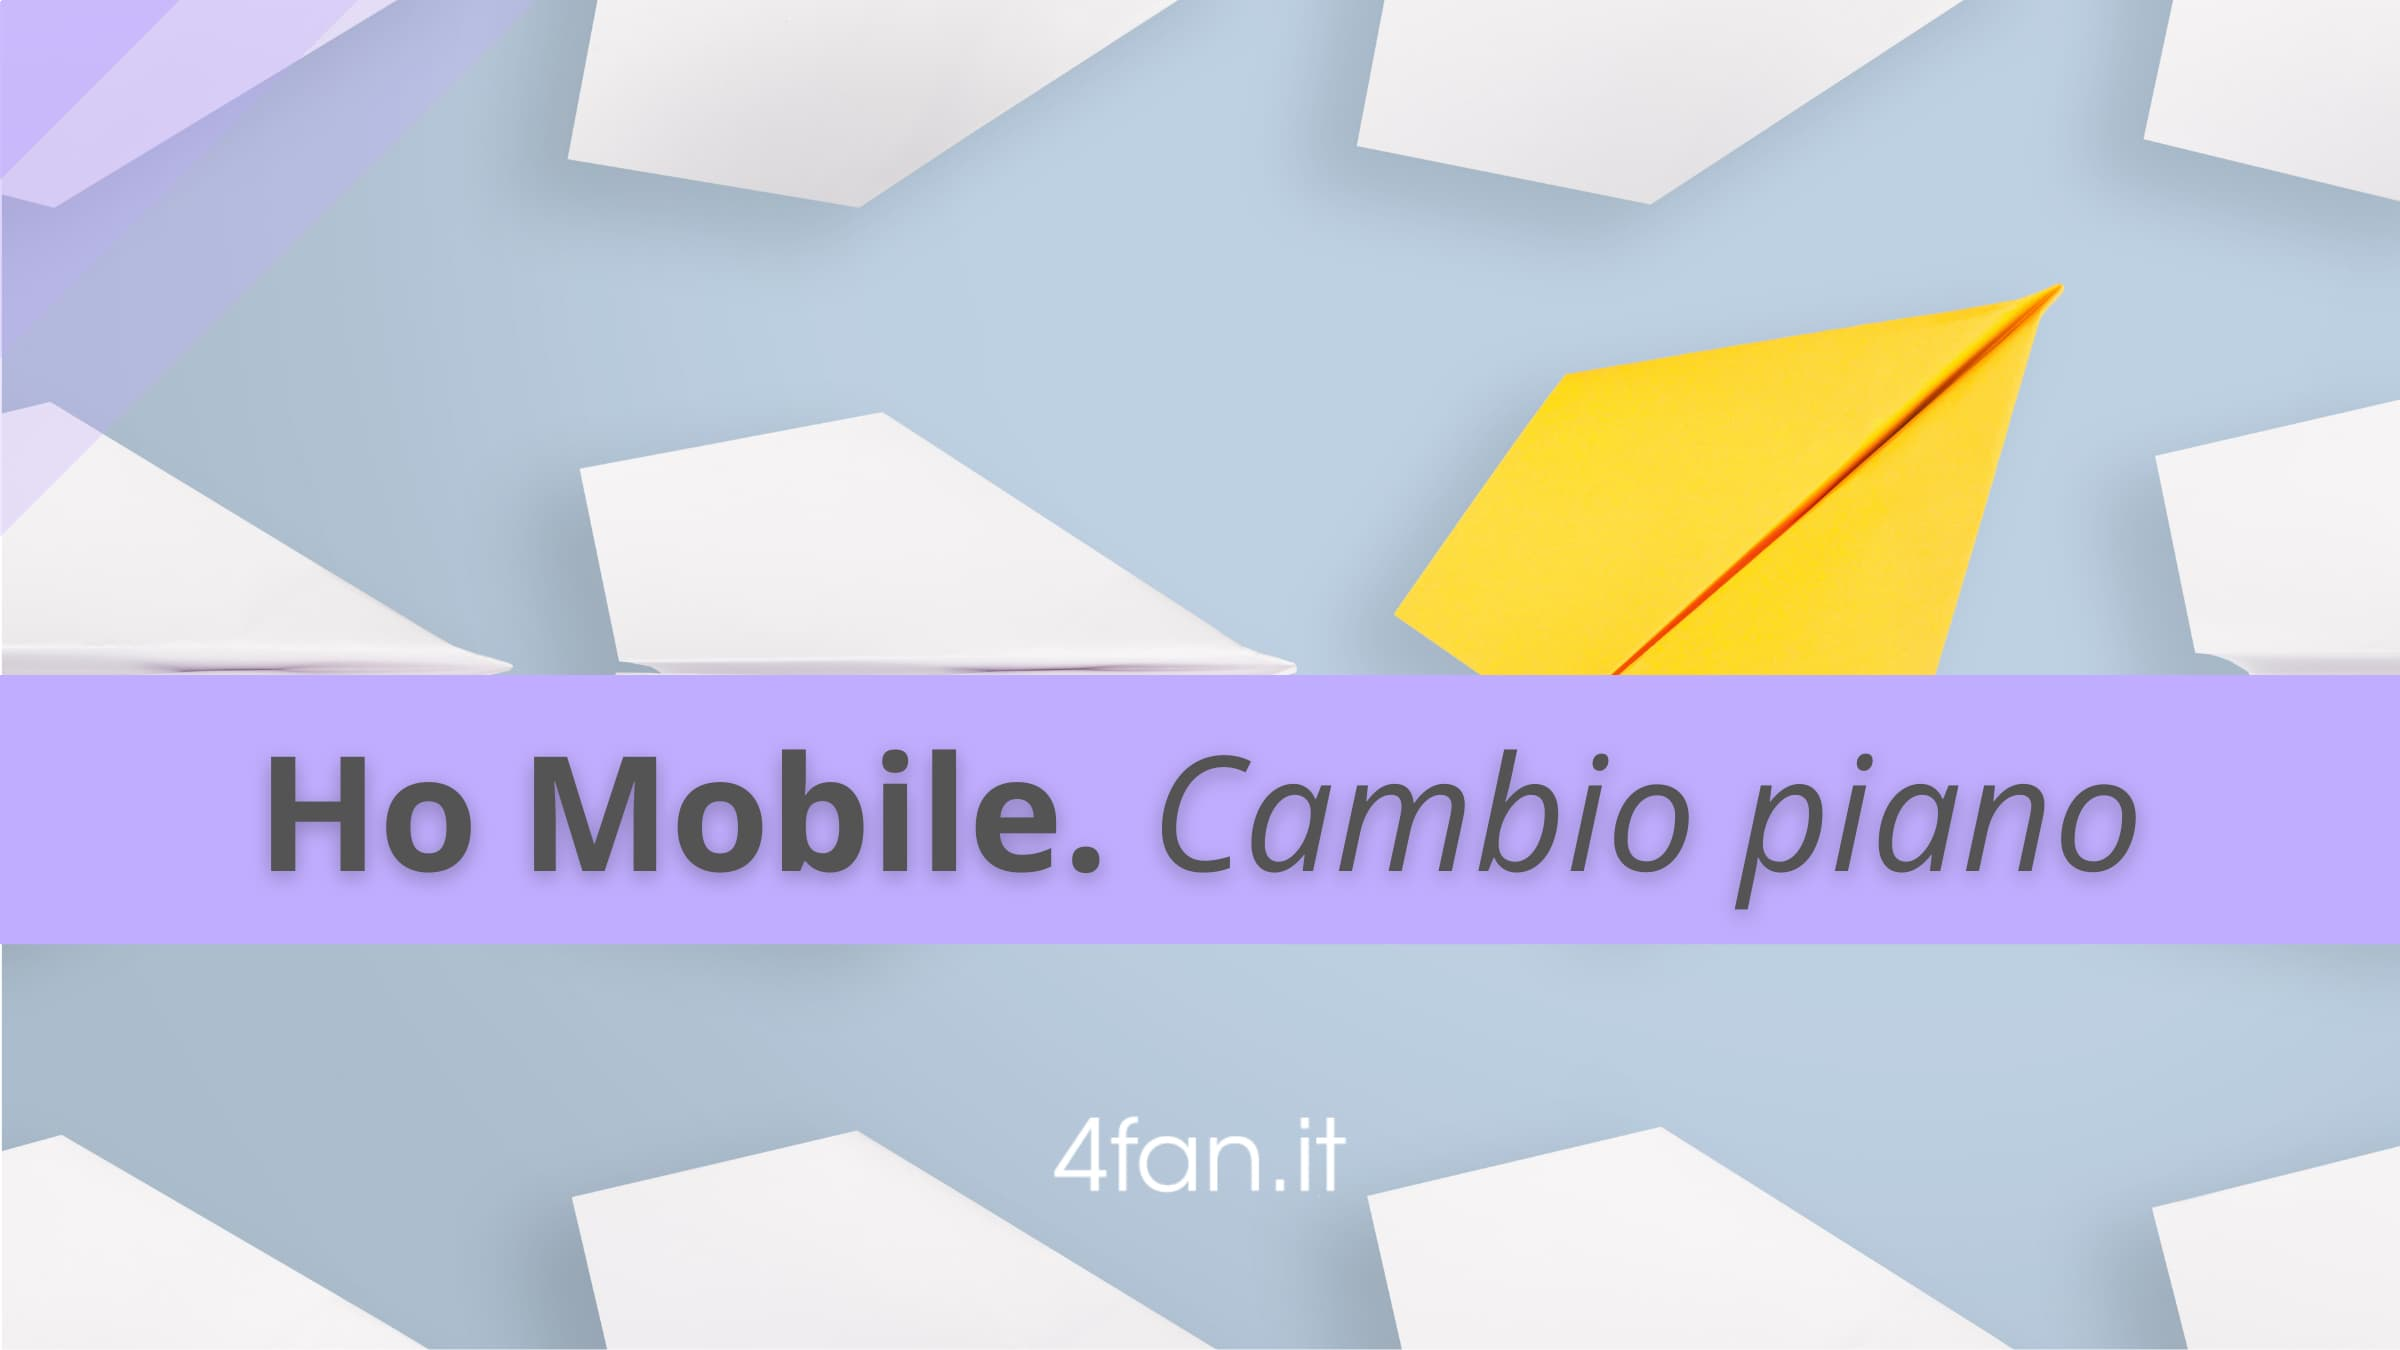 Ho Mobile cambio piano